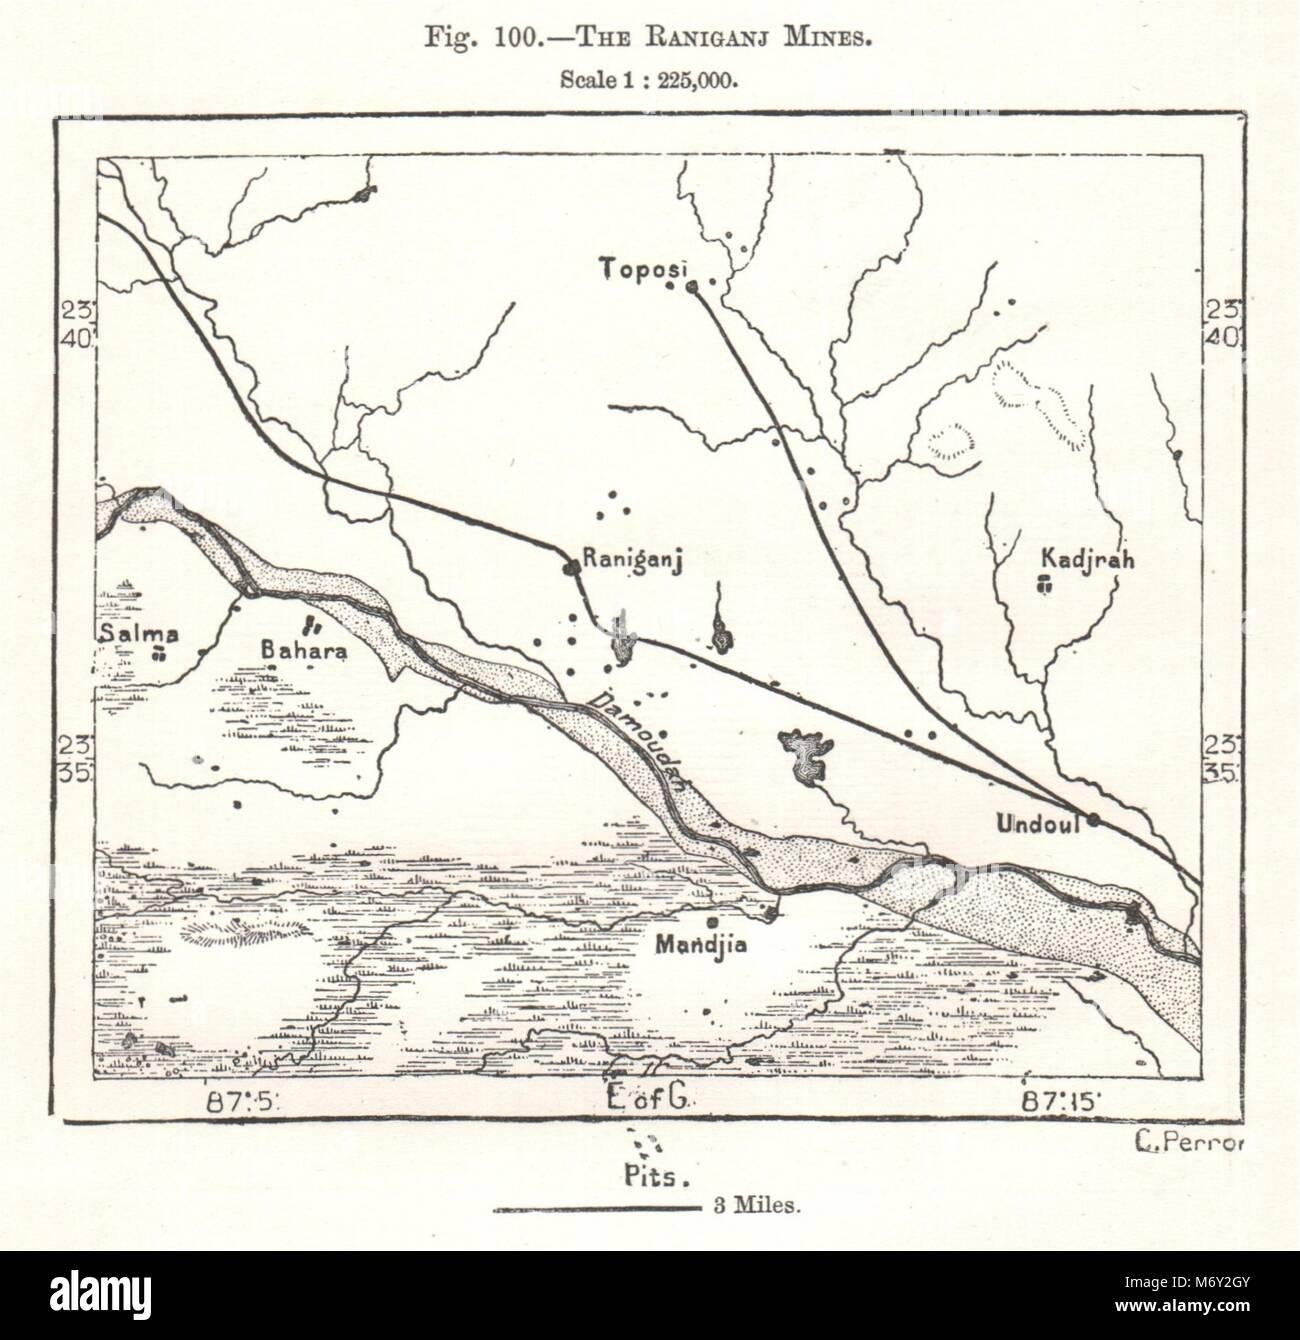 The Raniganj coalfields  Mines  India  Sketch map 1885 old